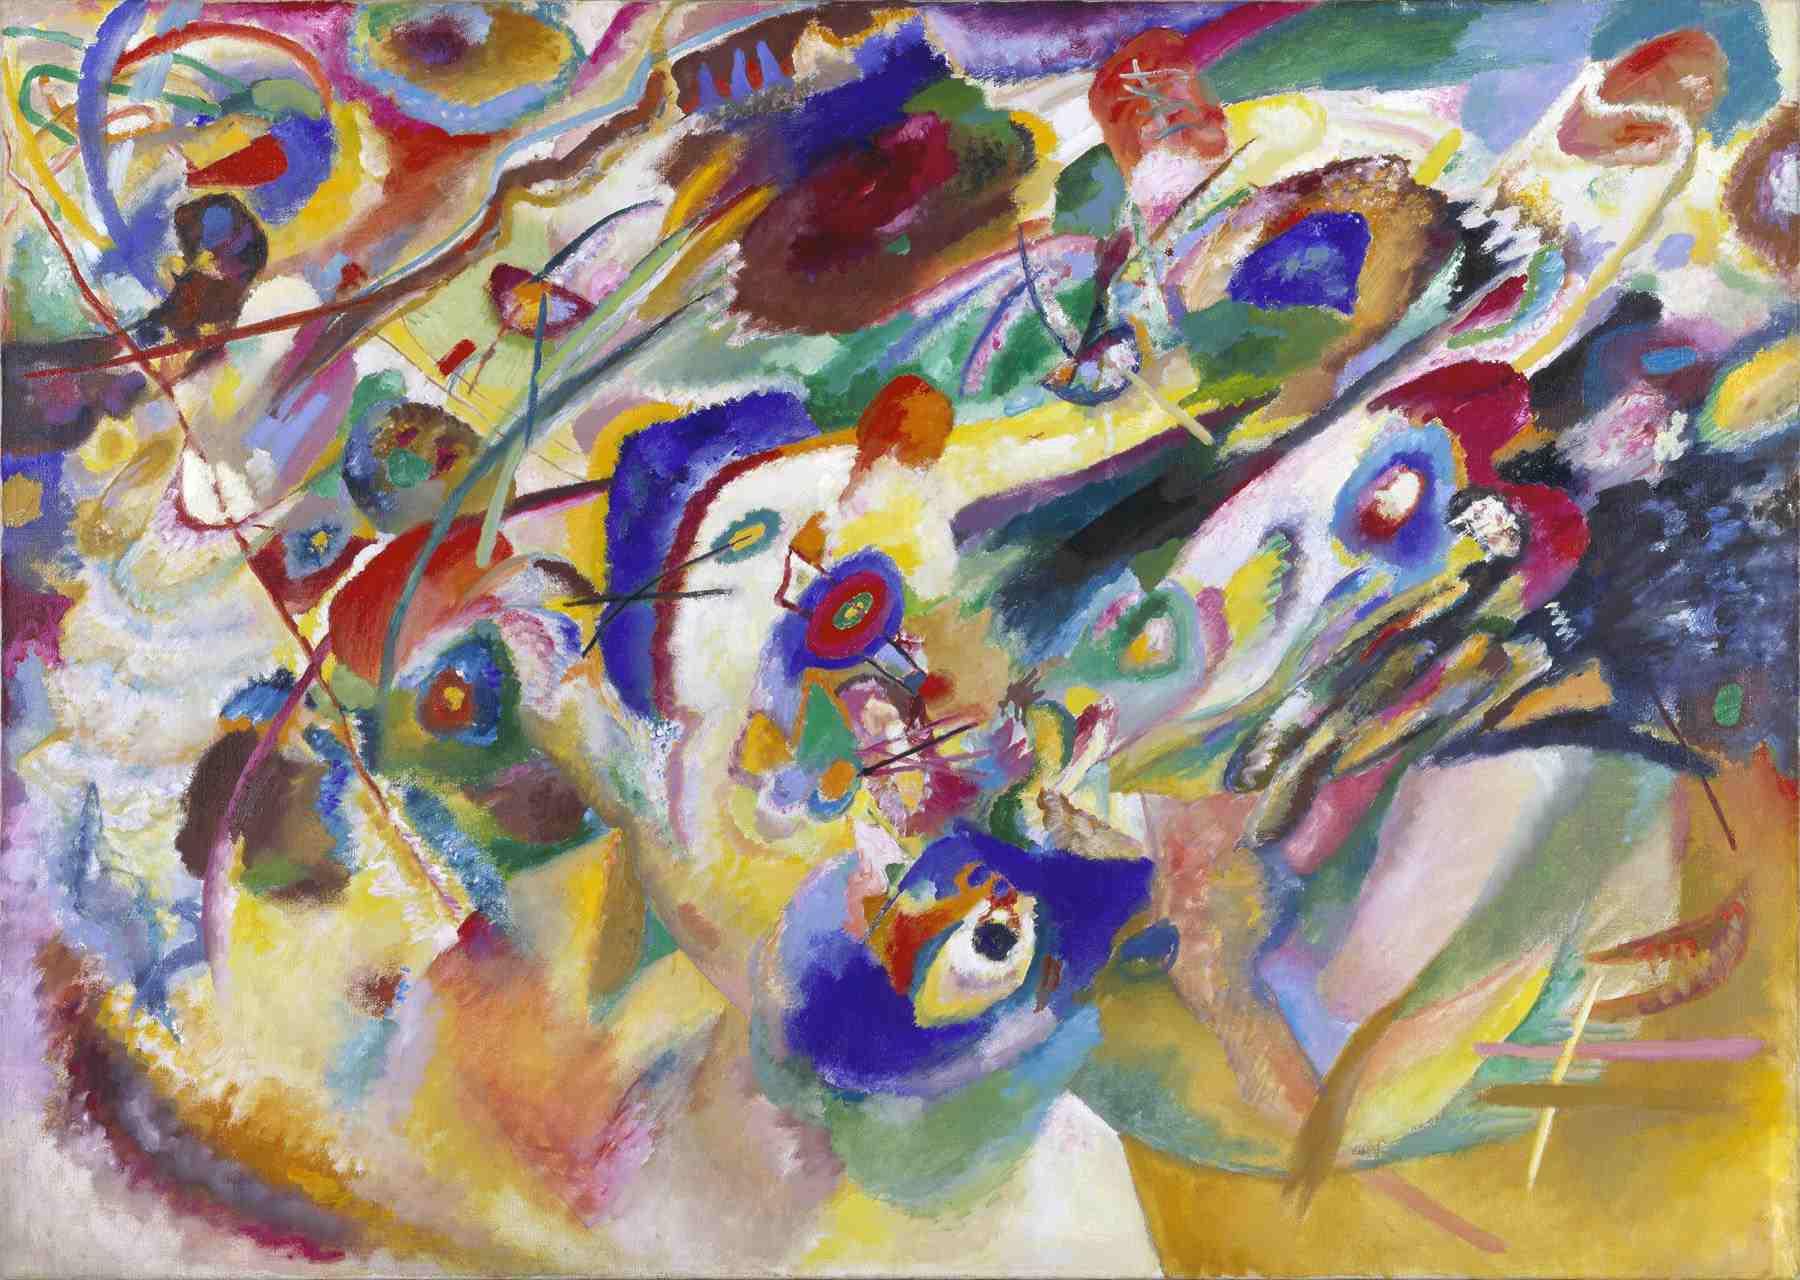 Wassily Kandinsky (Russian, 1866-1944) Wassily Kandinsky (Russian, 1866-1944). Sketch 2 for Composition VII (Entwurf 2 zu Komposition VII), 1913. Oil on canvas. 39 5/16 x 55 1/16 in. (100 x 140 cm). Gabriele Münter-Stiftung, 1957. Städtische Galerie im Lenbachhaus, Munich.